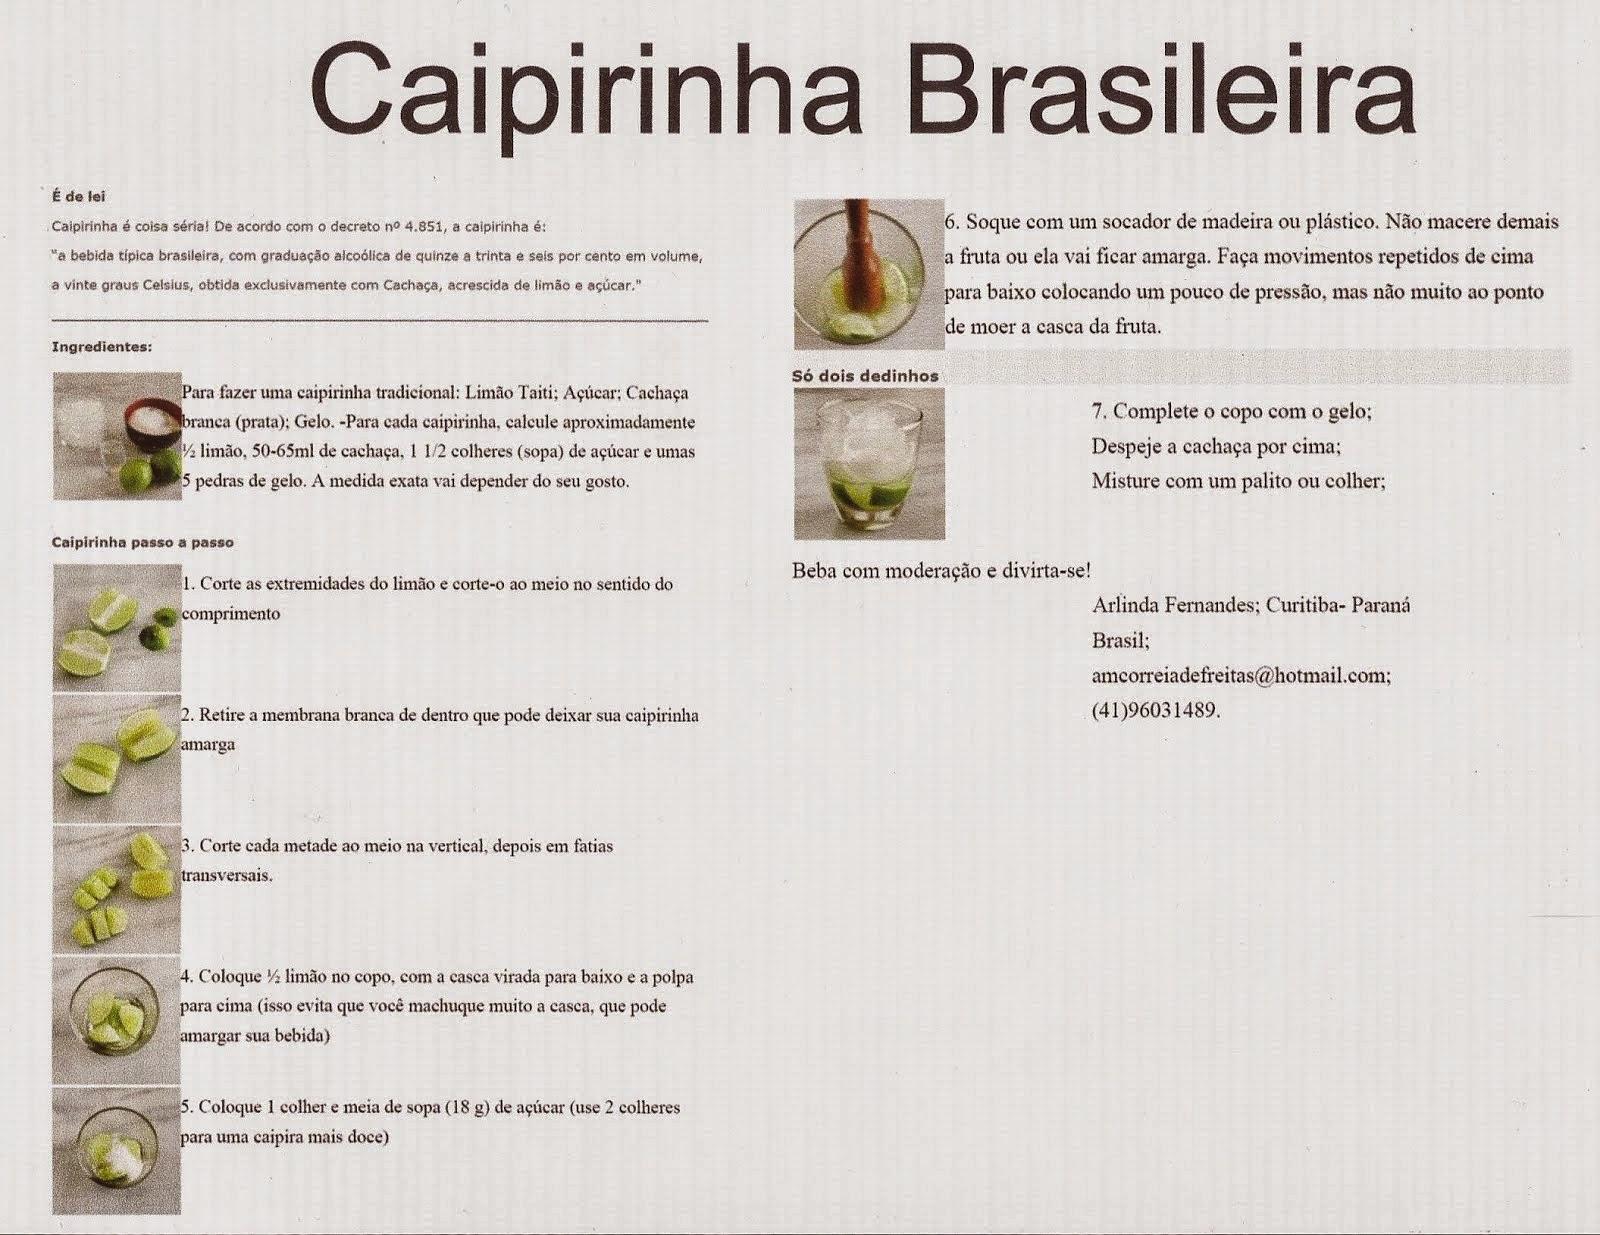 Arlinda Fernandes - Brasil